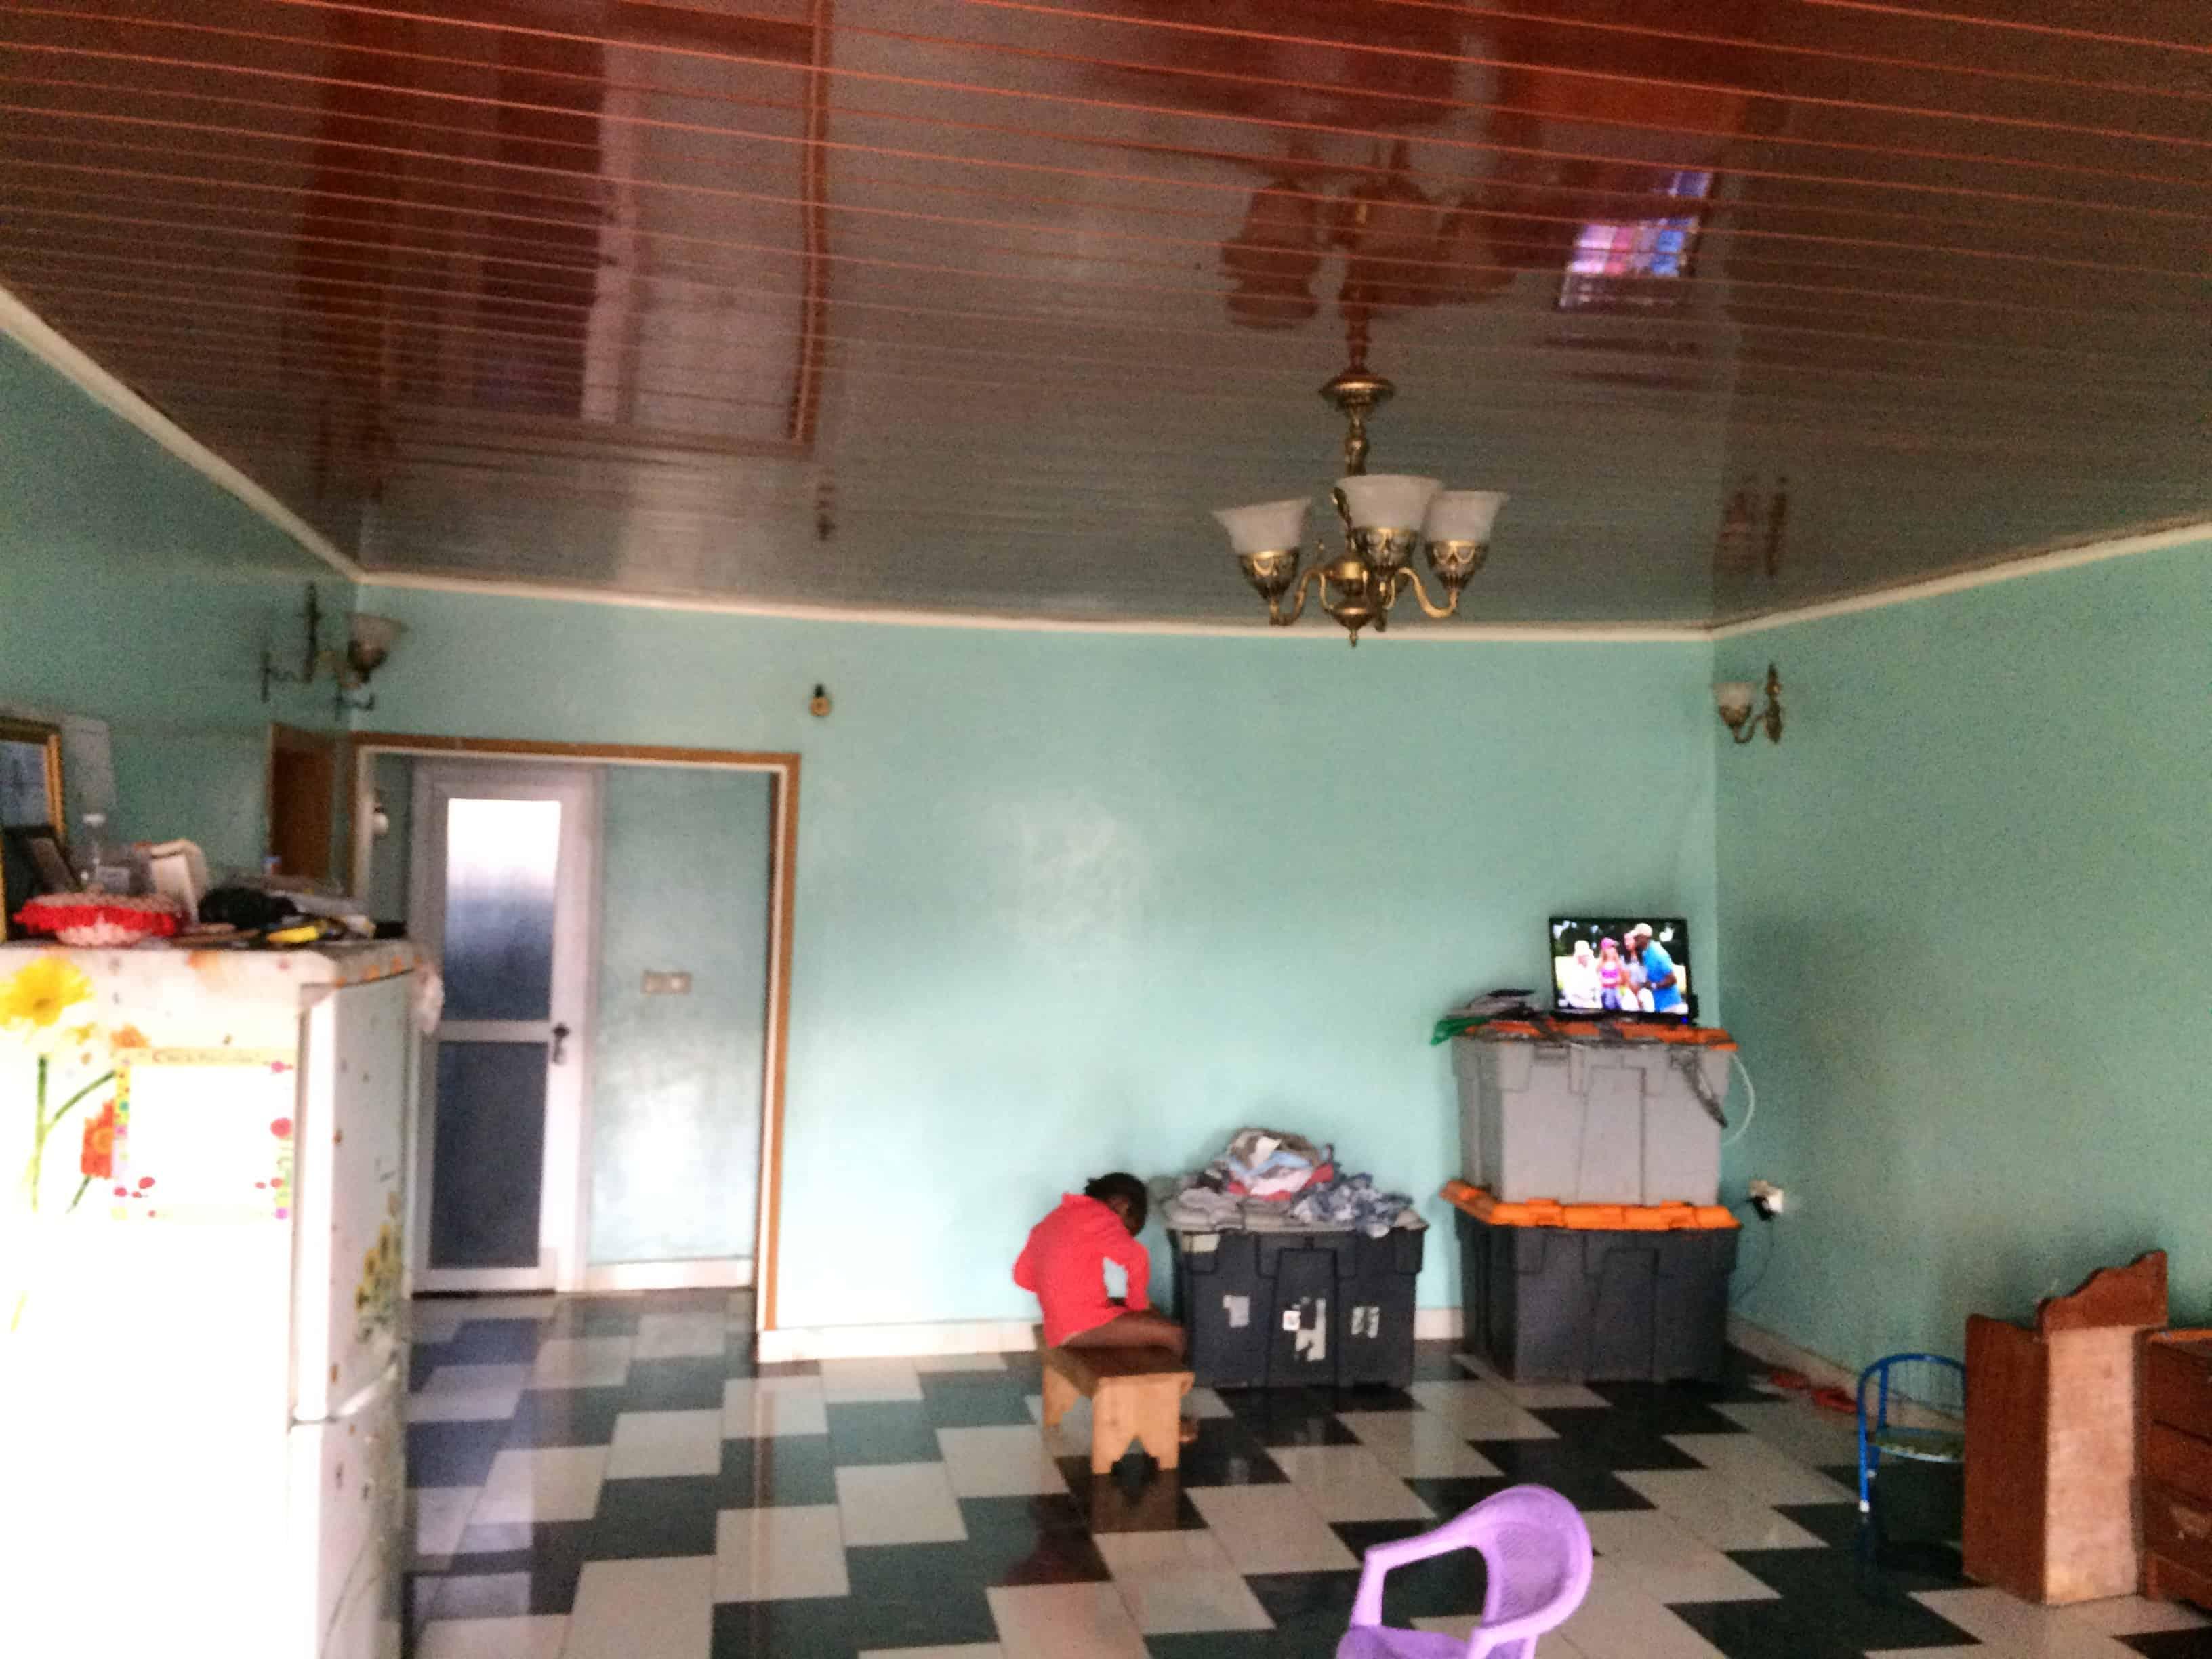 Apartment to rent - Yaoundé, Nkolafeme, Rue 6751 - 1 living room(s), 3 bedroom(s), 2 bathroom(s) - 100 000 FCFA / month